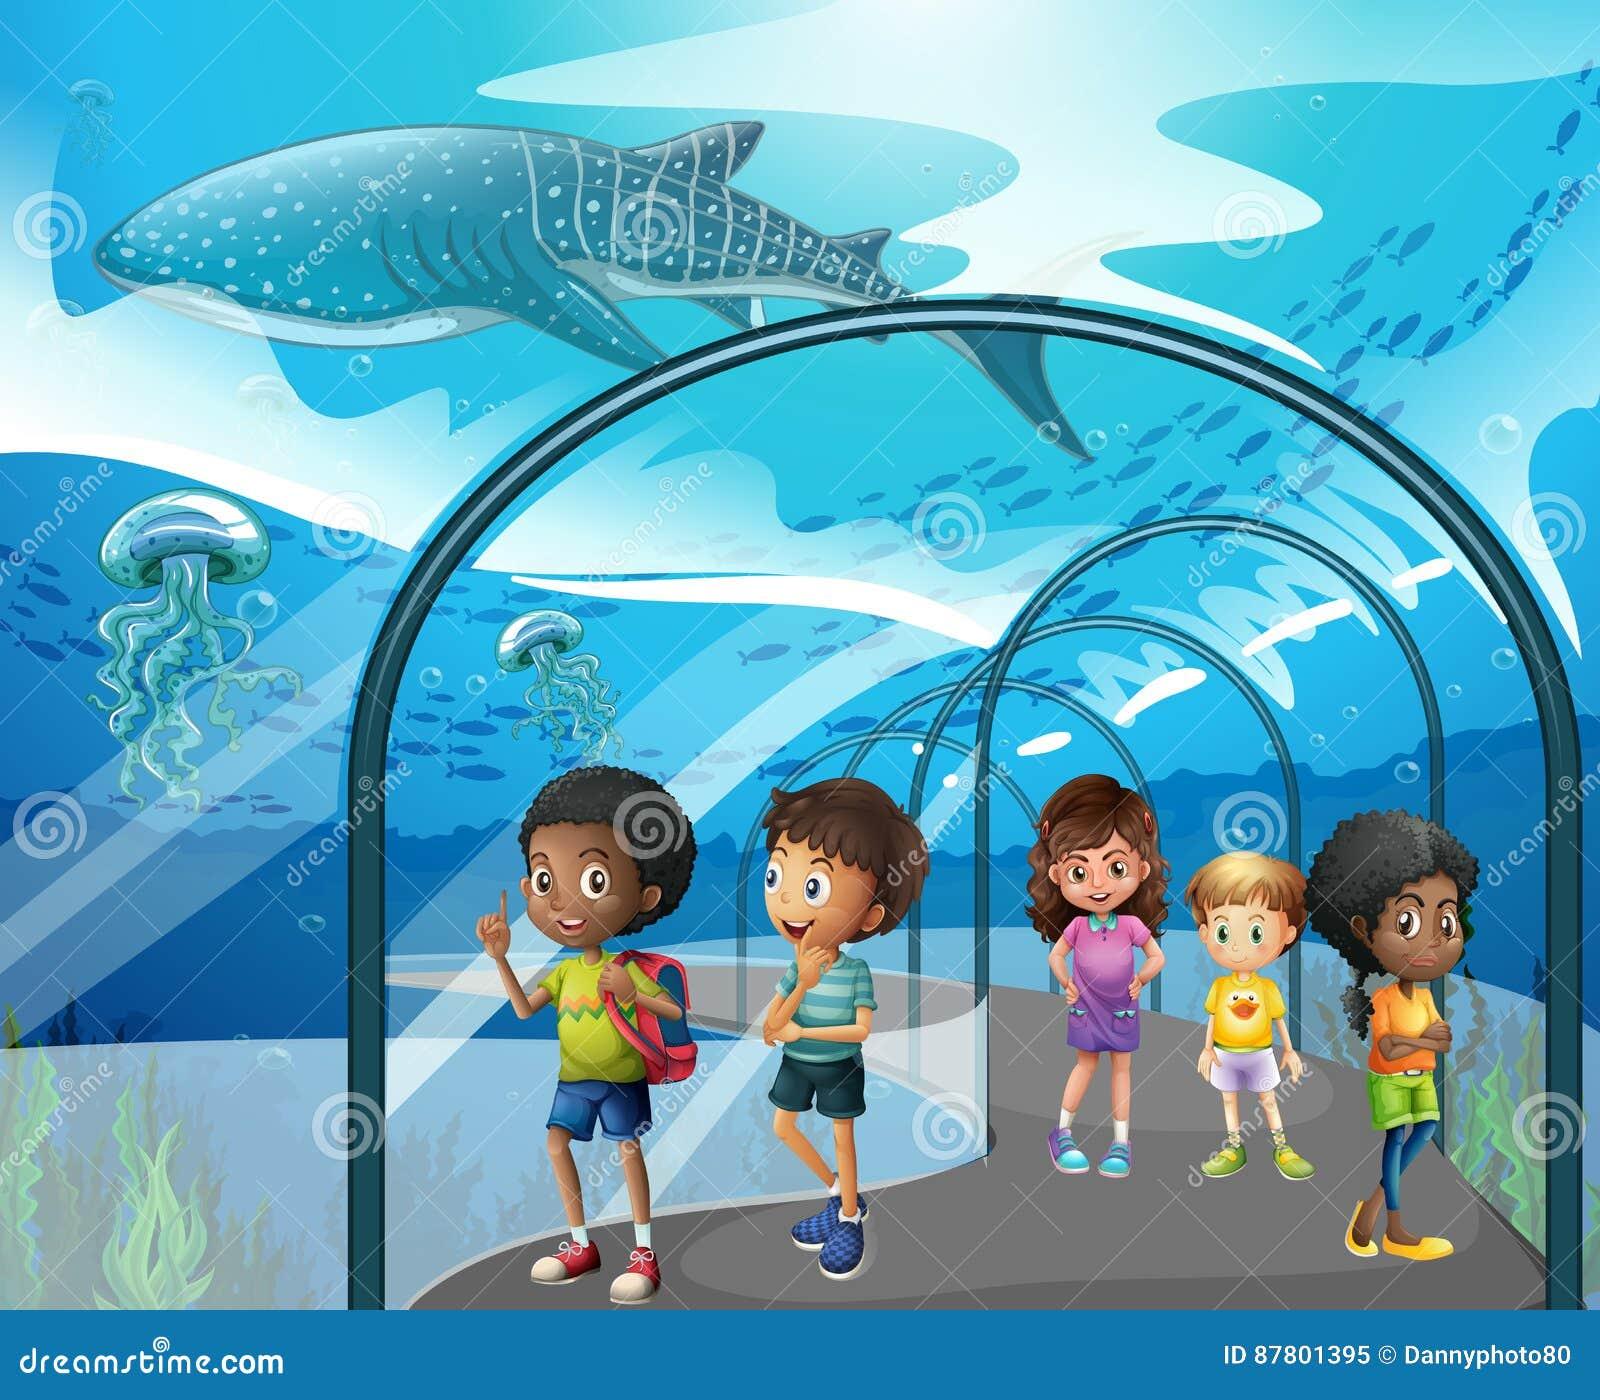 Children looking at fish in aquarium stock vector image for Childrens fish tank